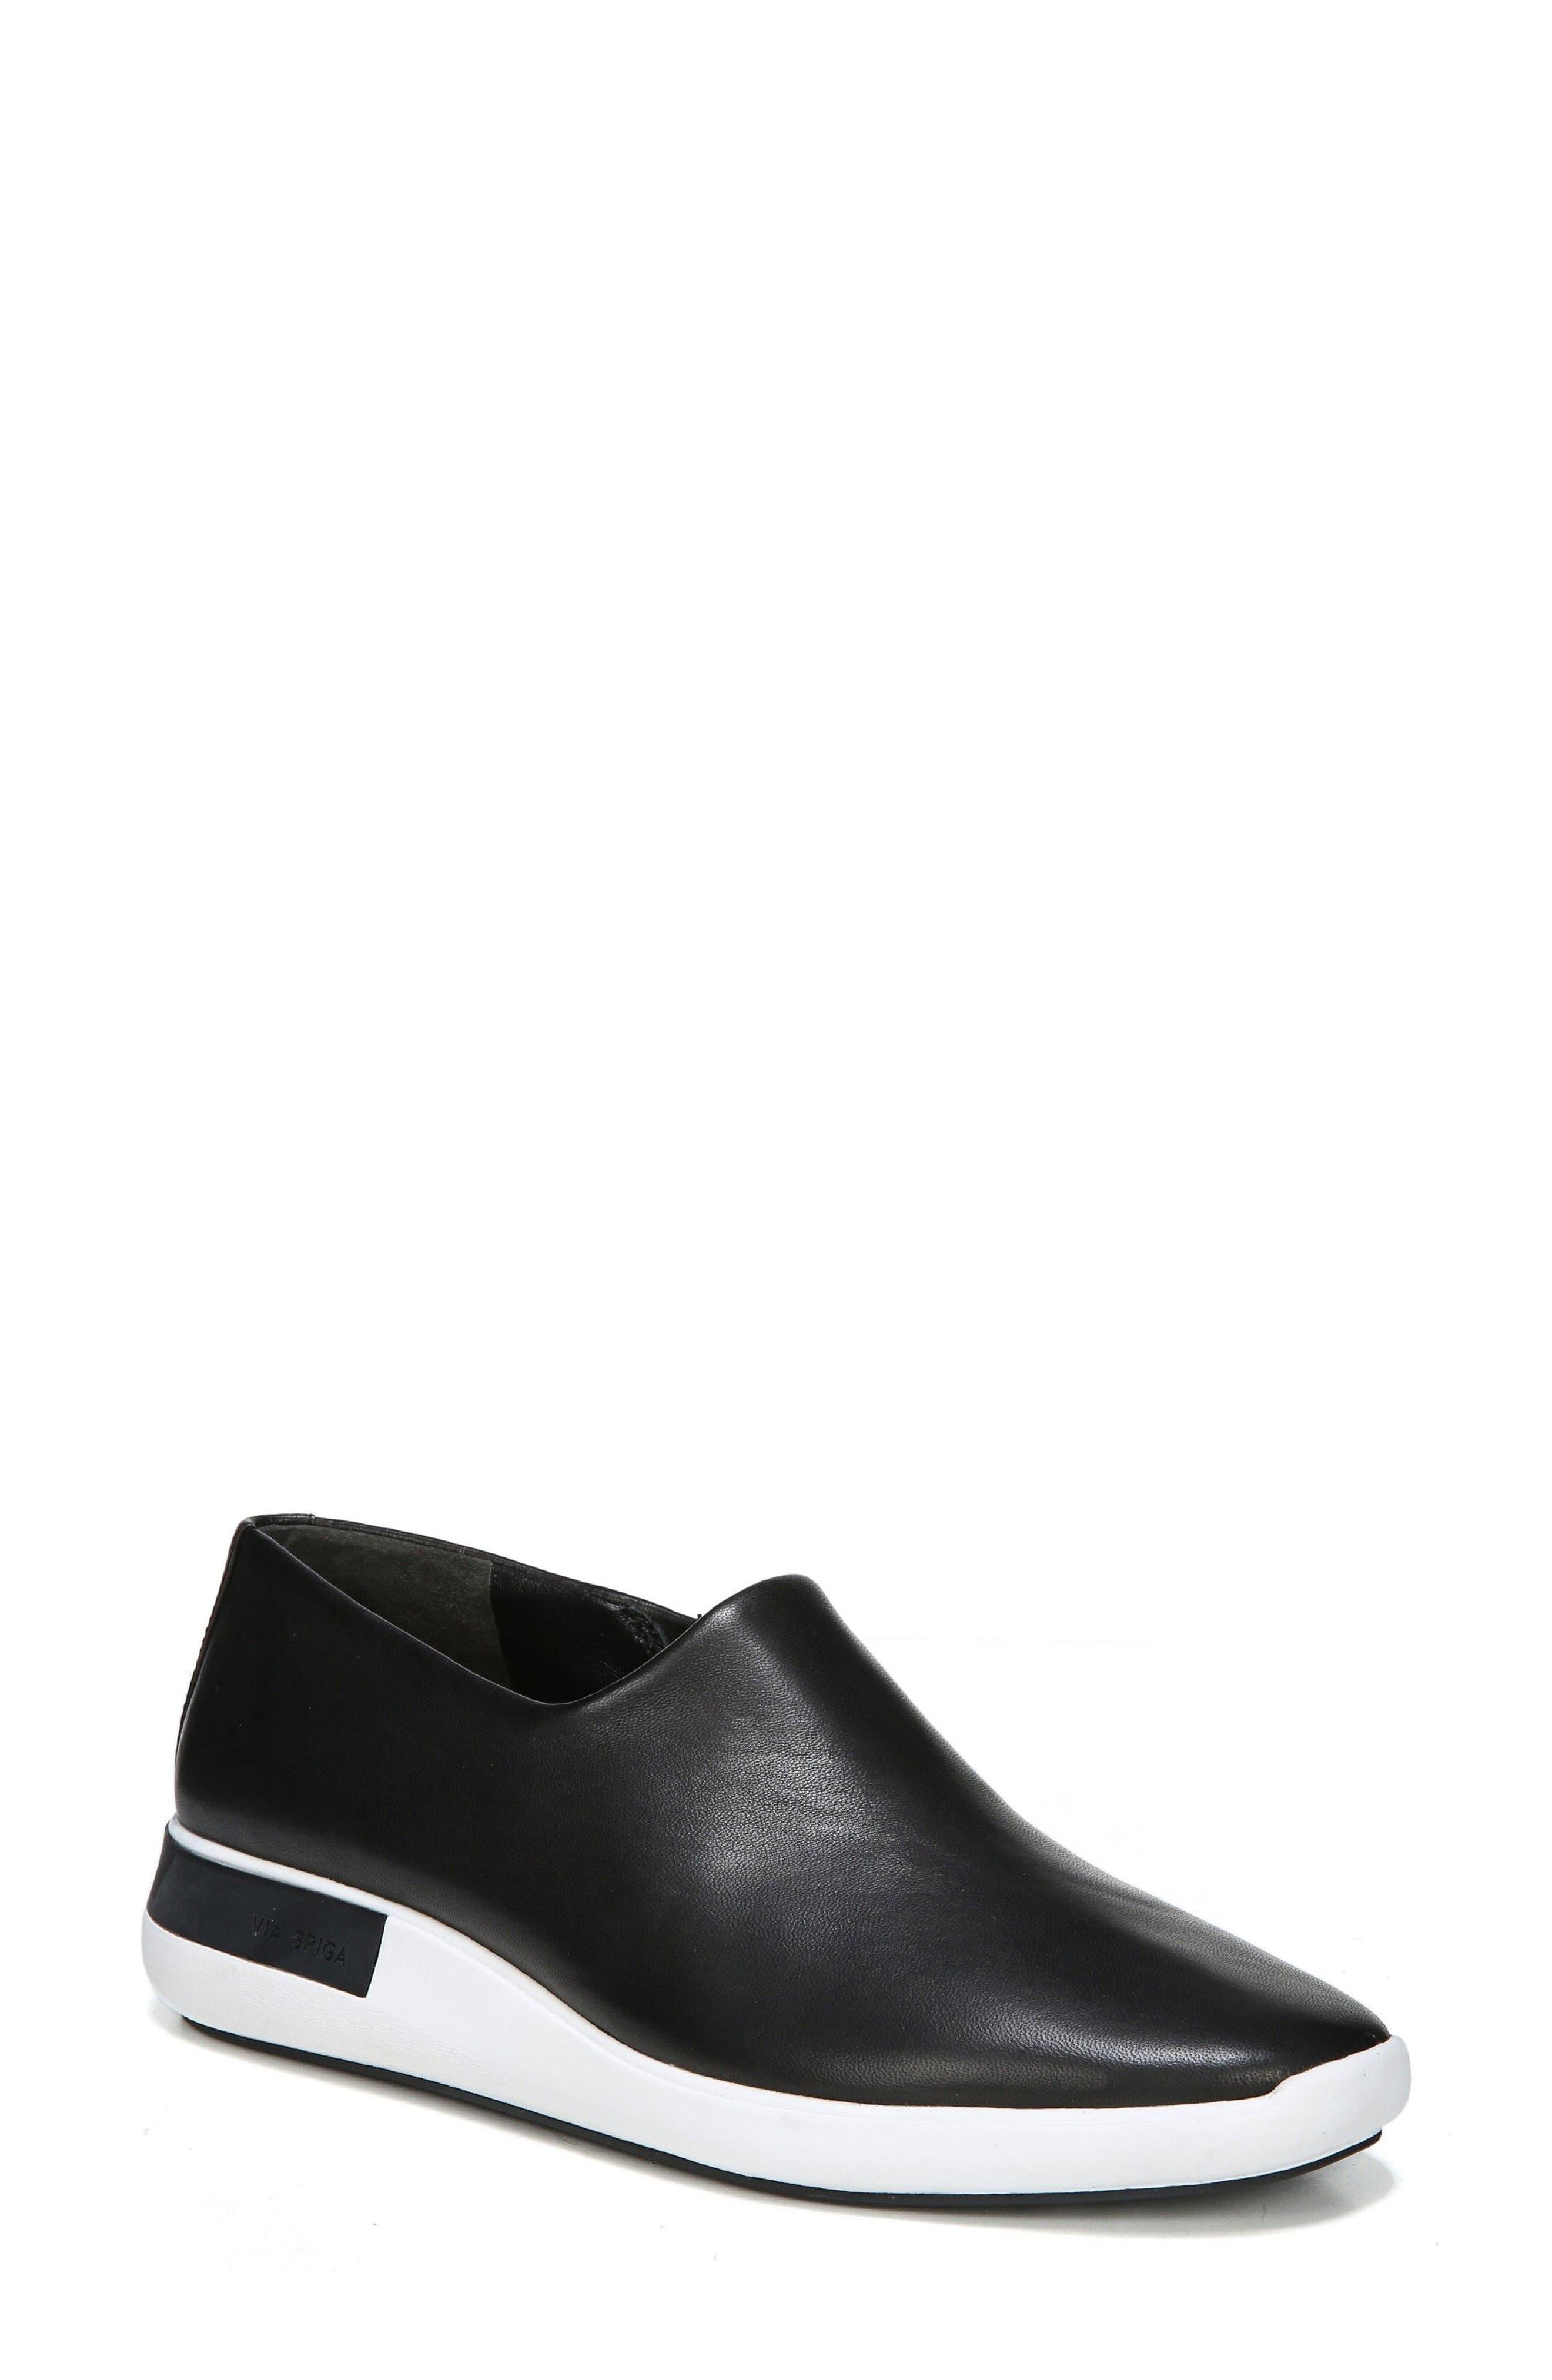 Malena Slip-On Sneaker,                             Main thumbnail 1, color,                             001